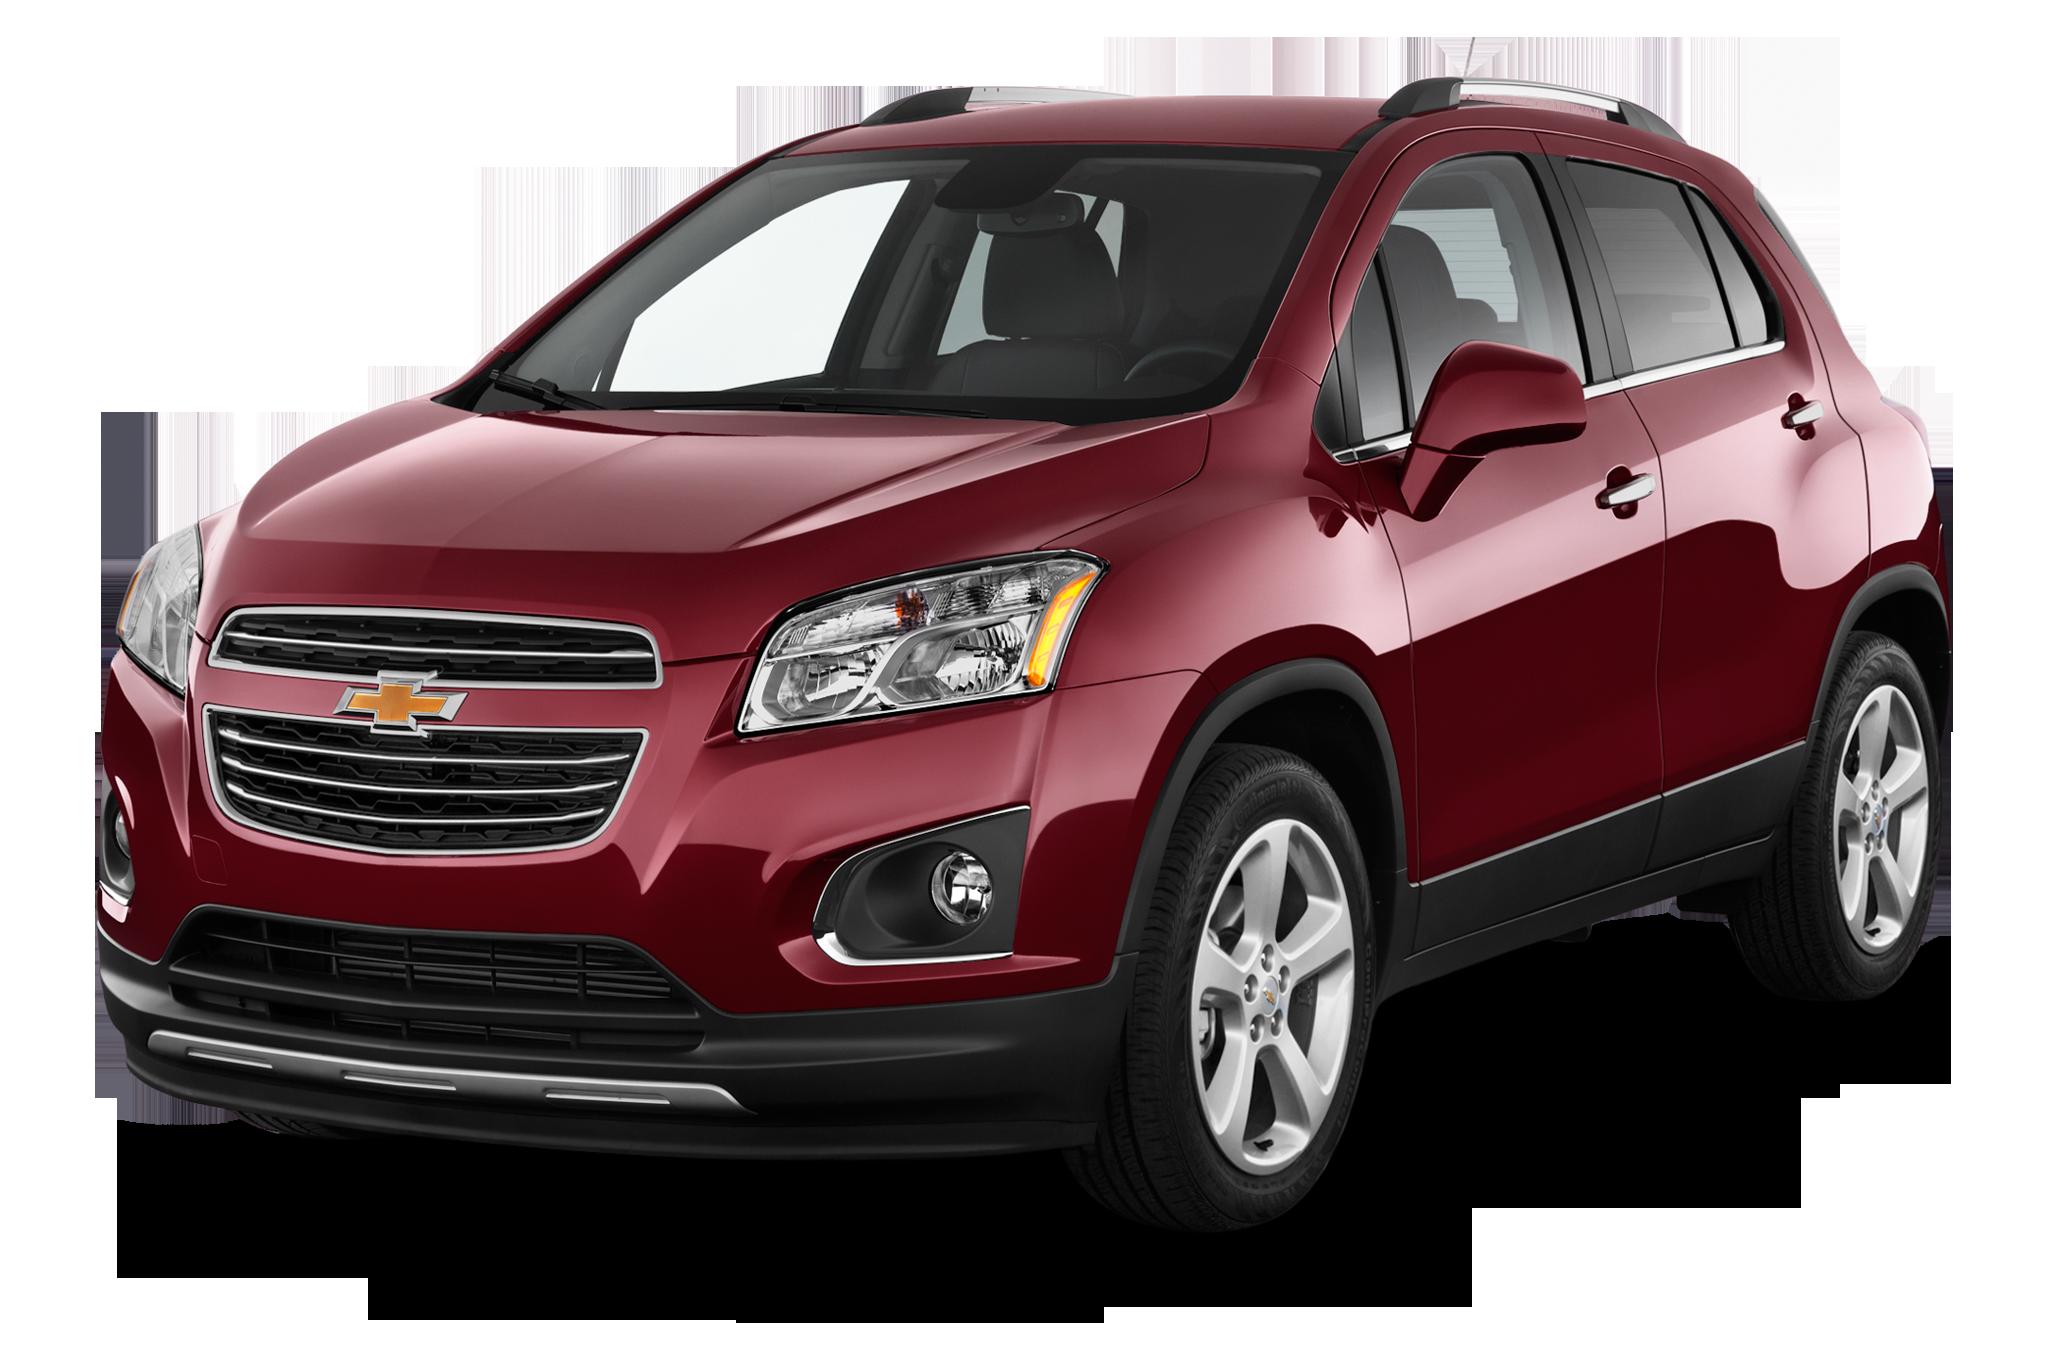 2016 Chevrolet Trax Reviews.